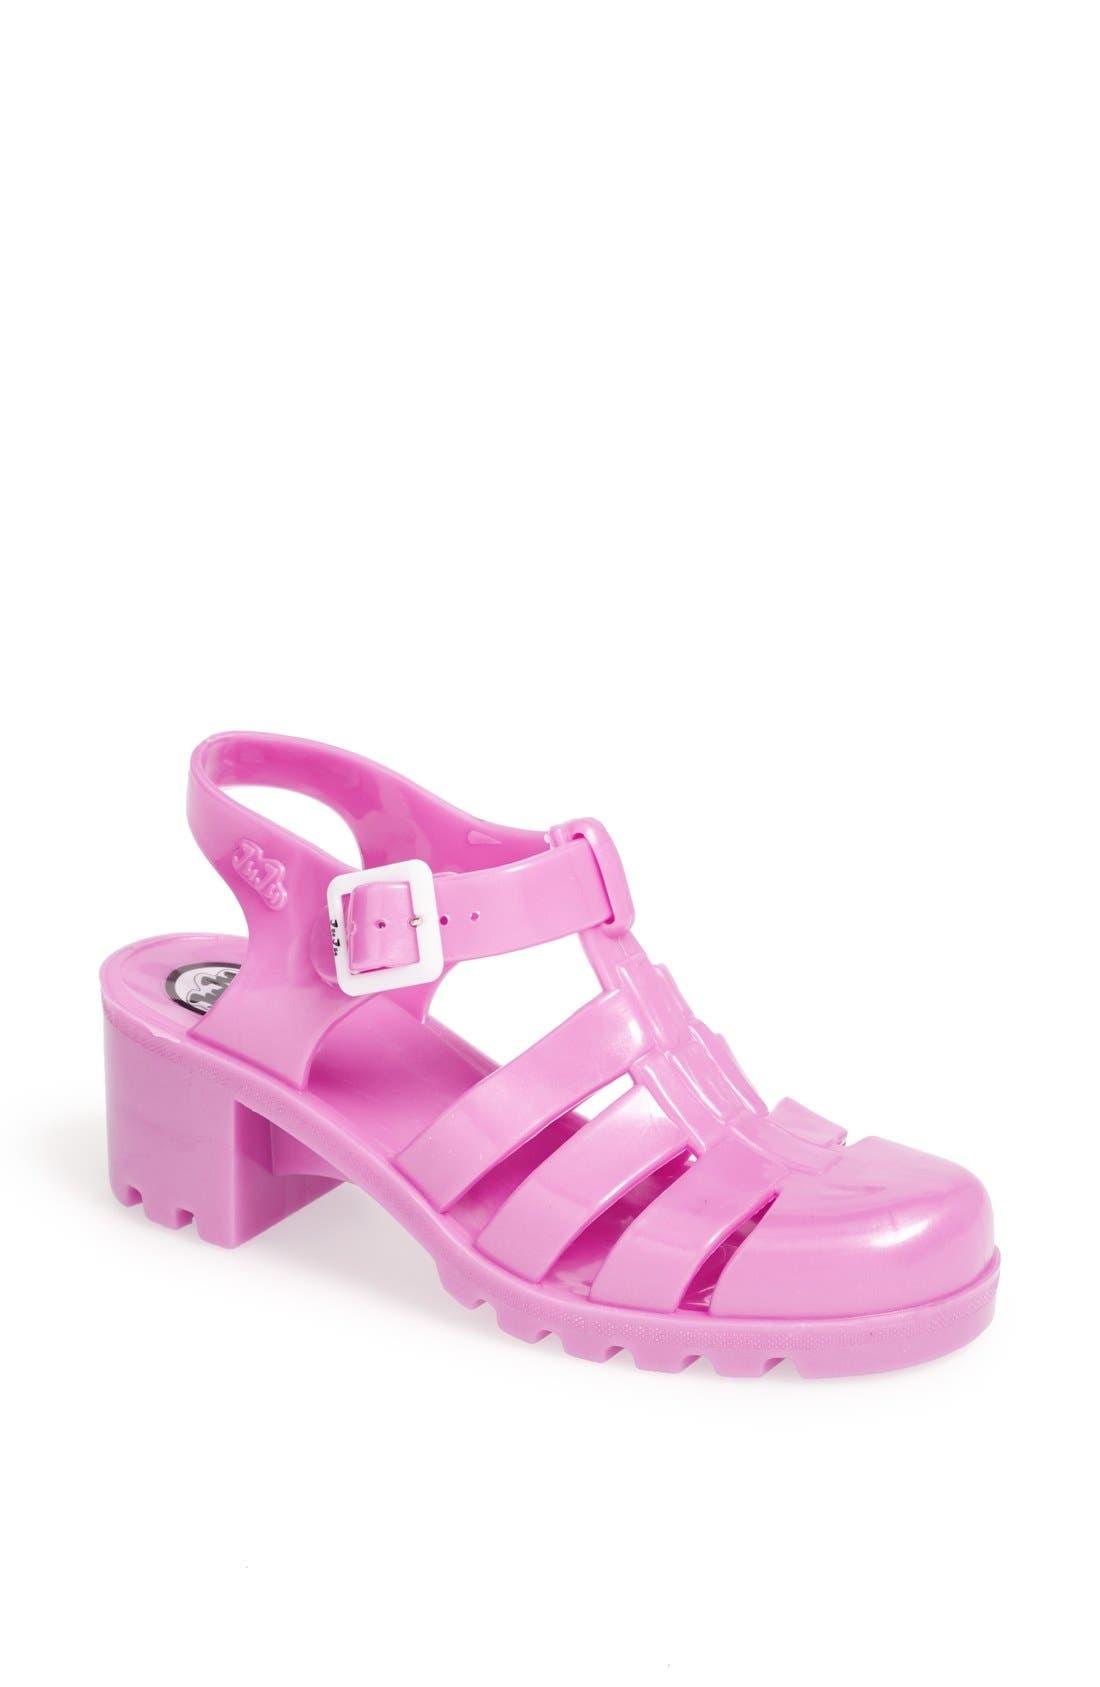 Main Image - Topshop 'Nina' Jelly Sandal